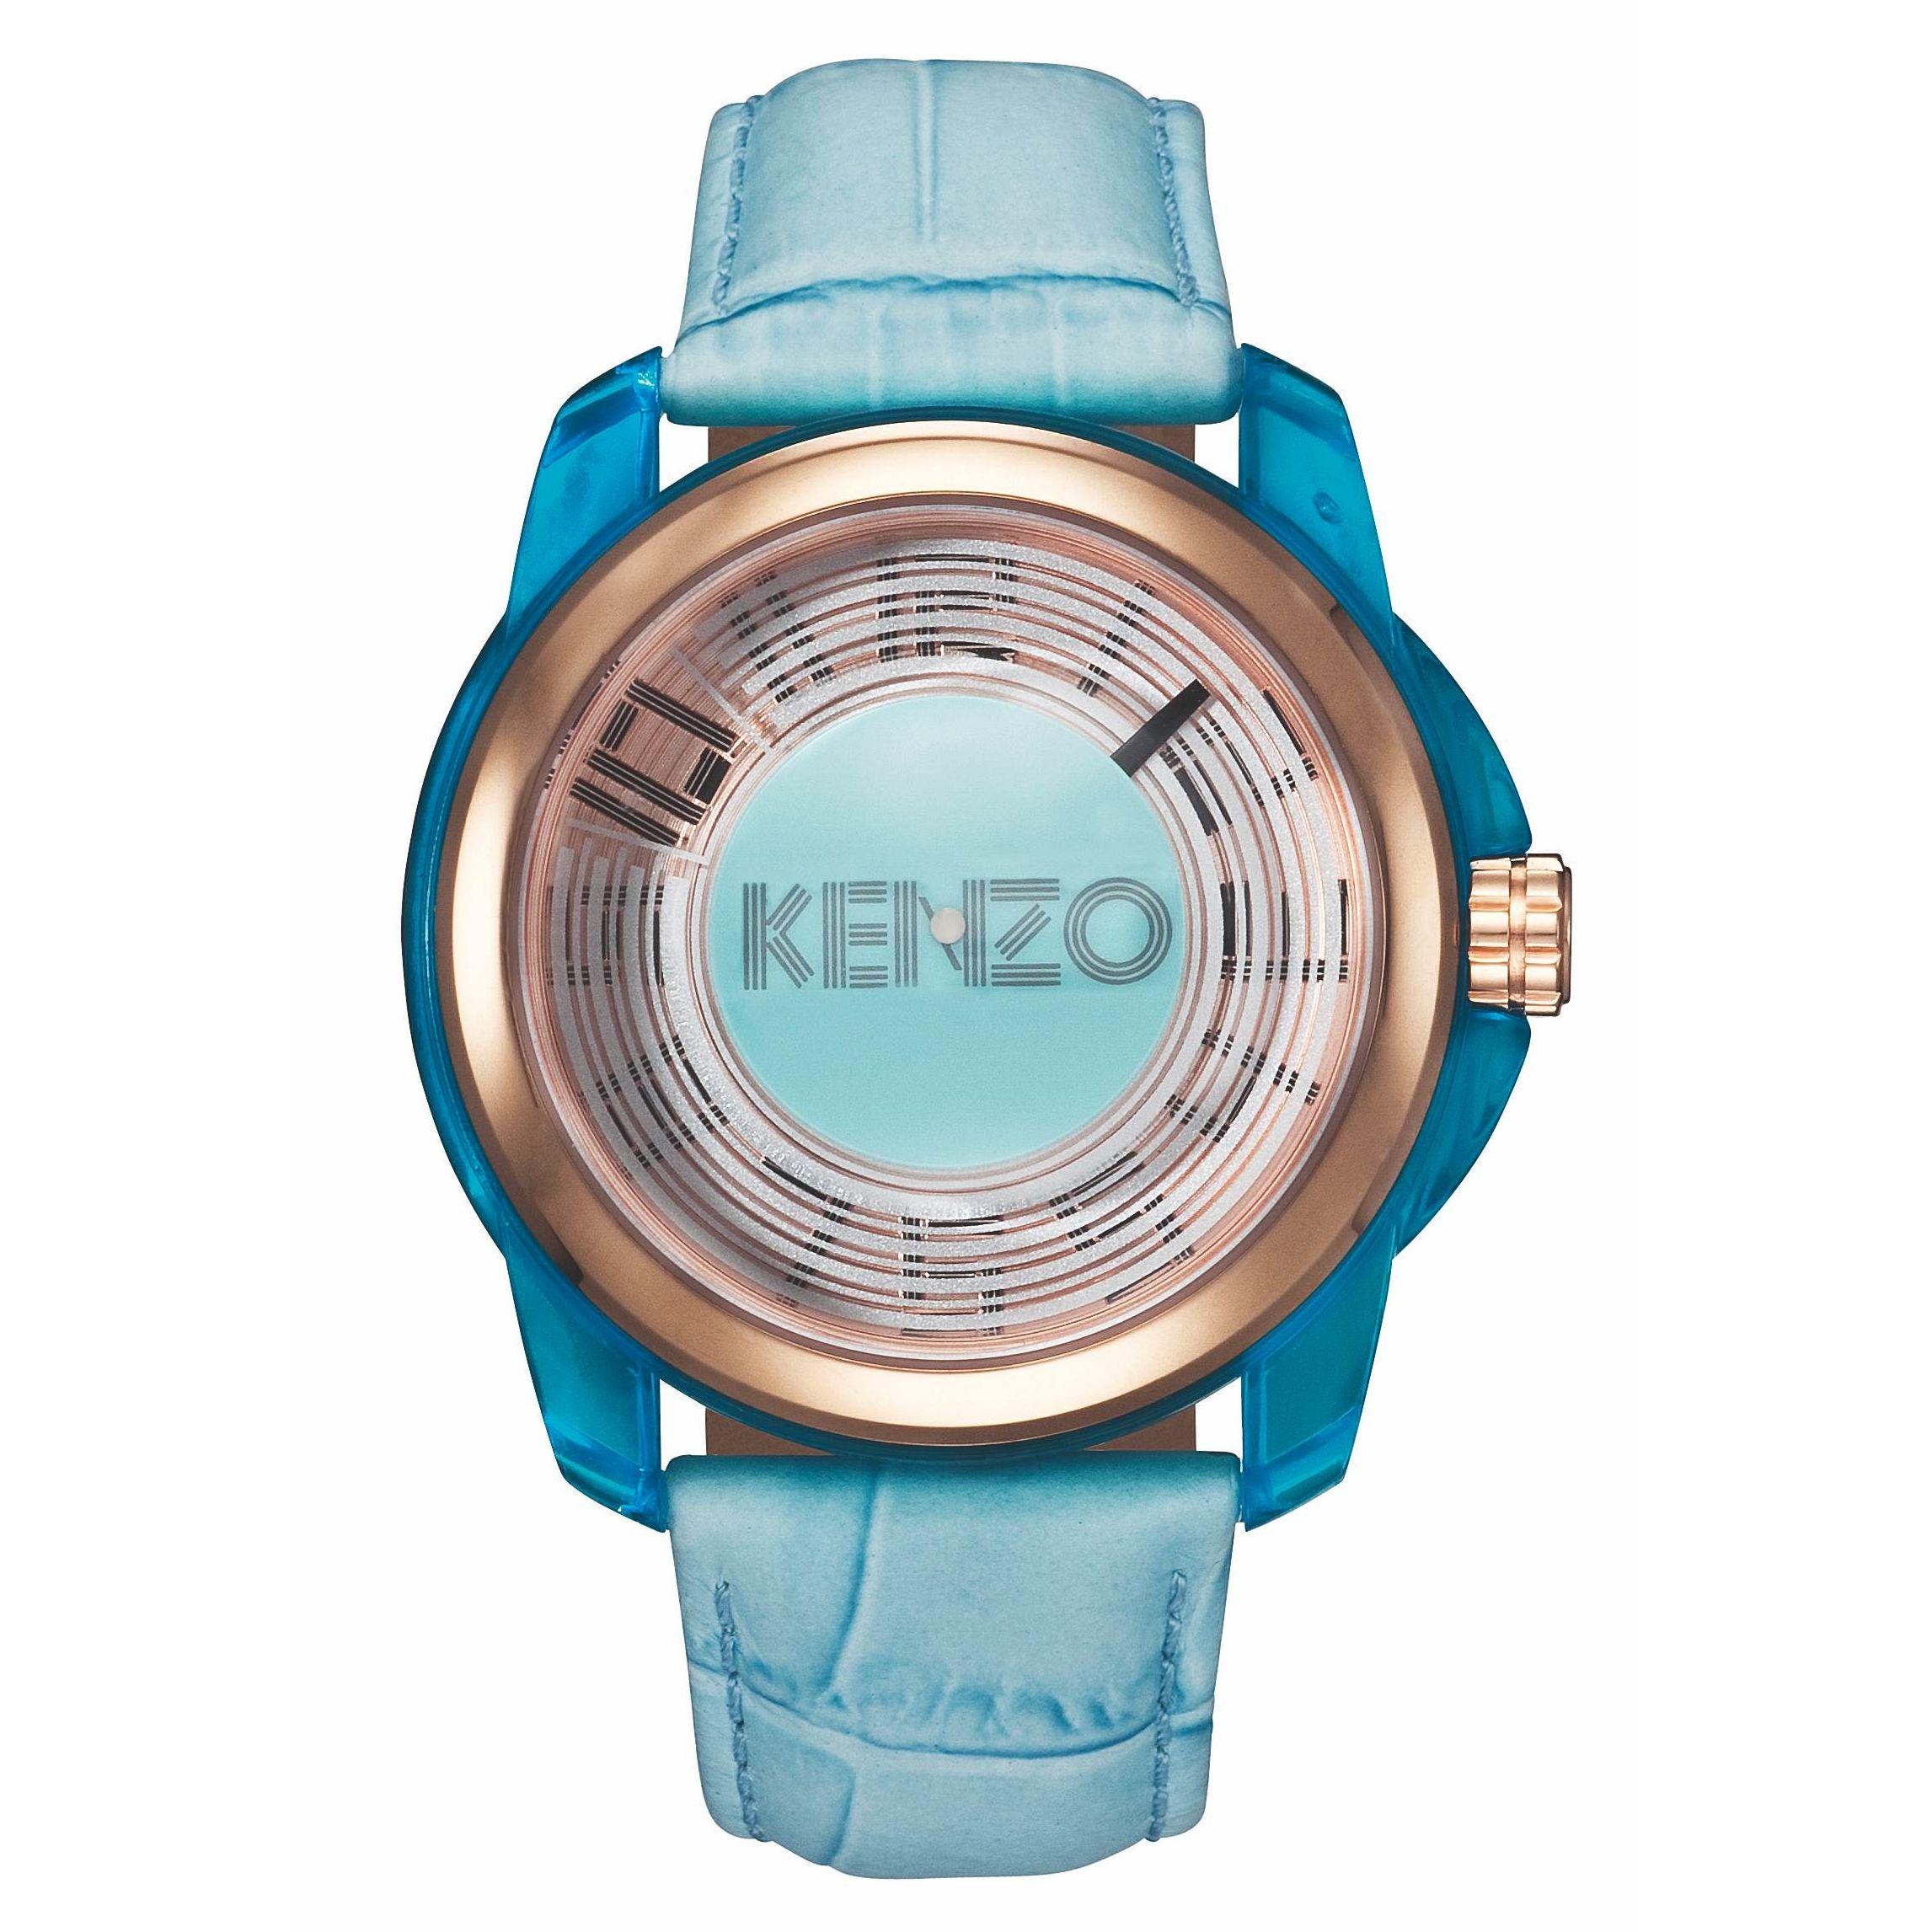 orologio Kenzo donna K0094004 mod Galaxy